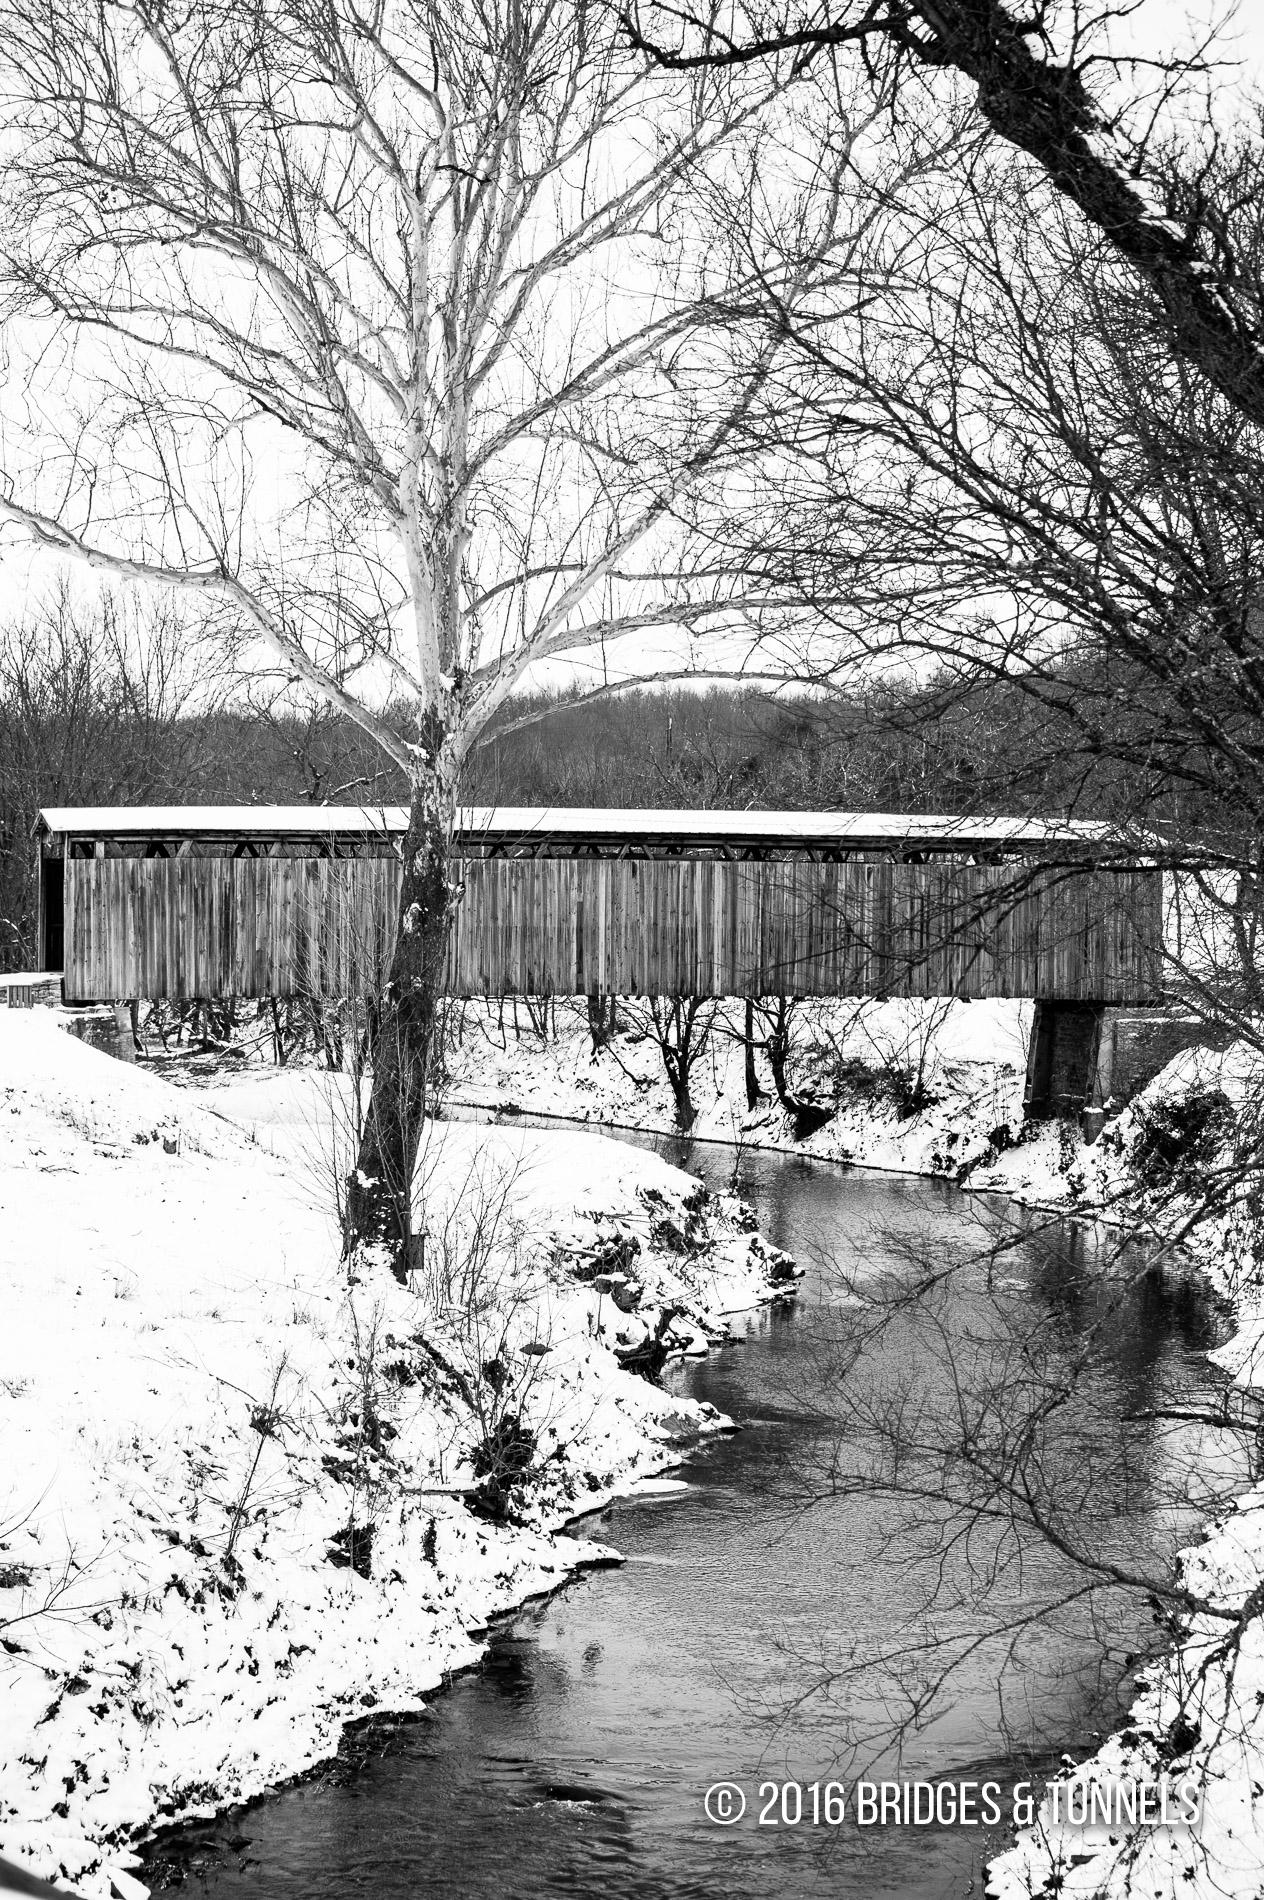 Johnson Creek Covered Bridge